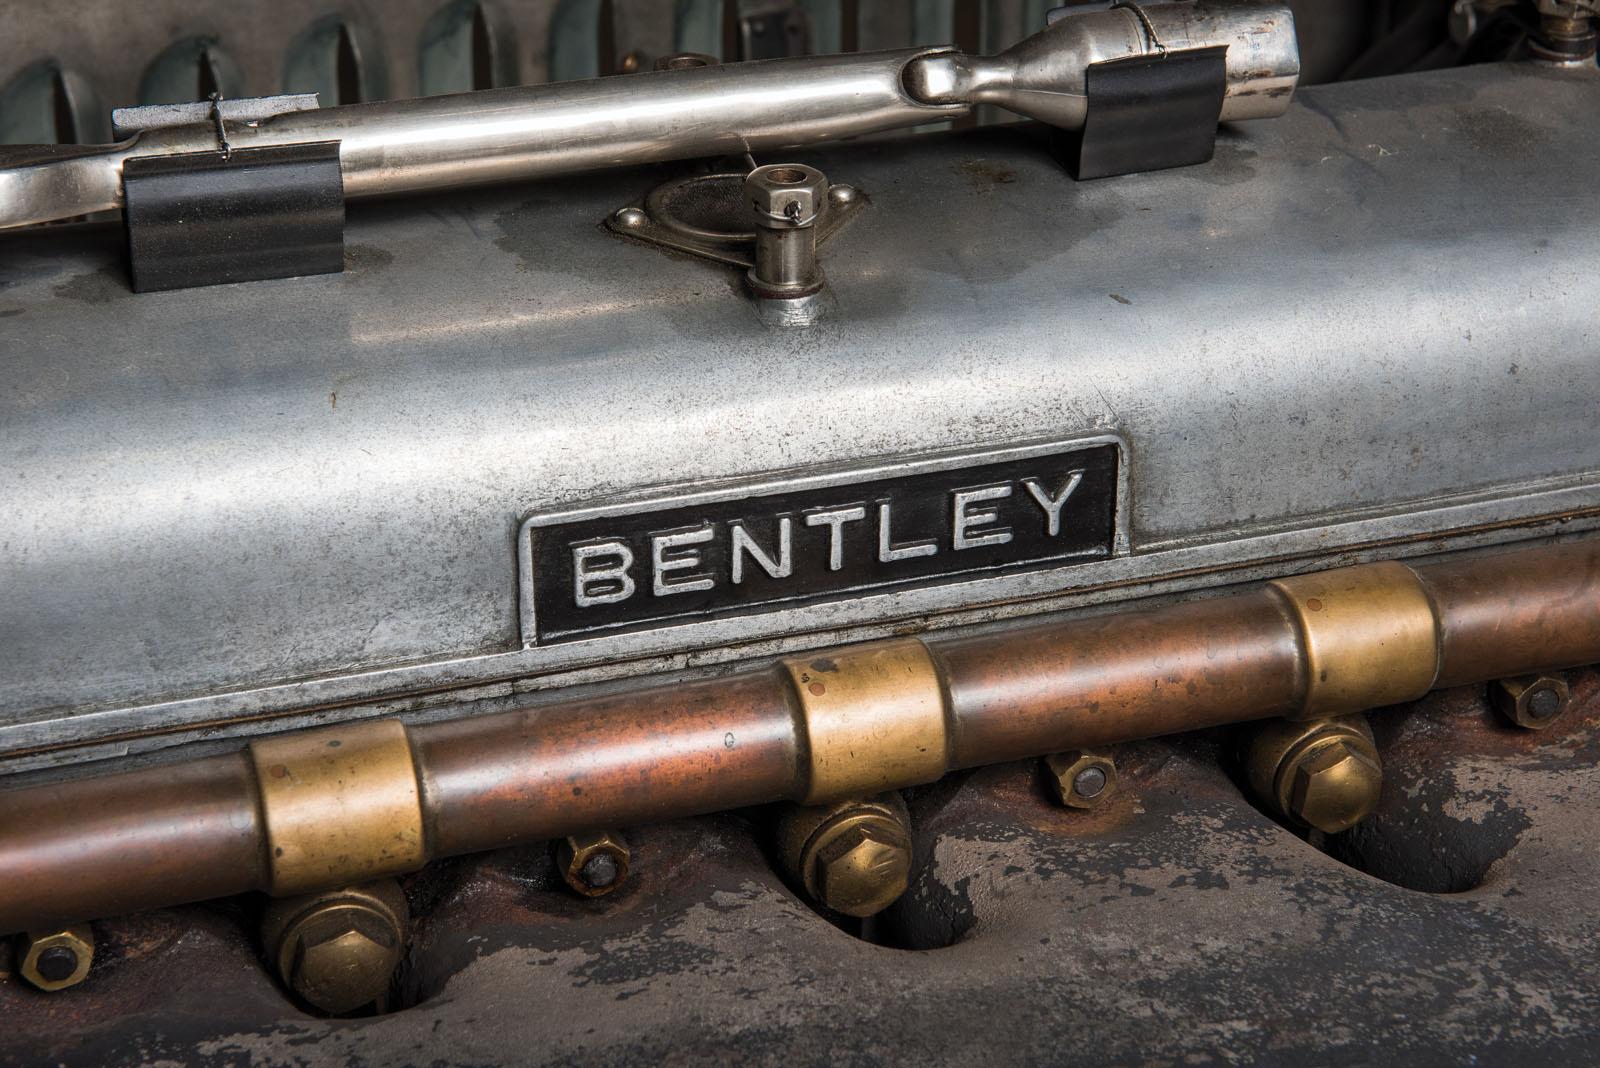 Bentley Le Mans Racer 1928 (51)